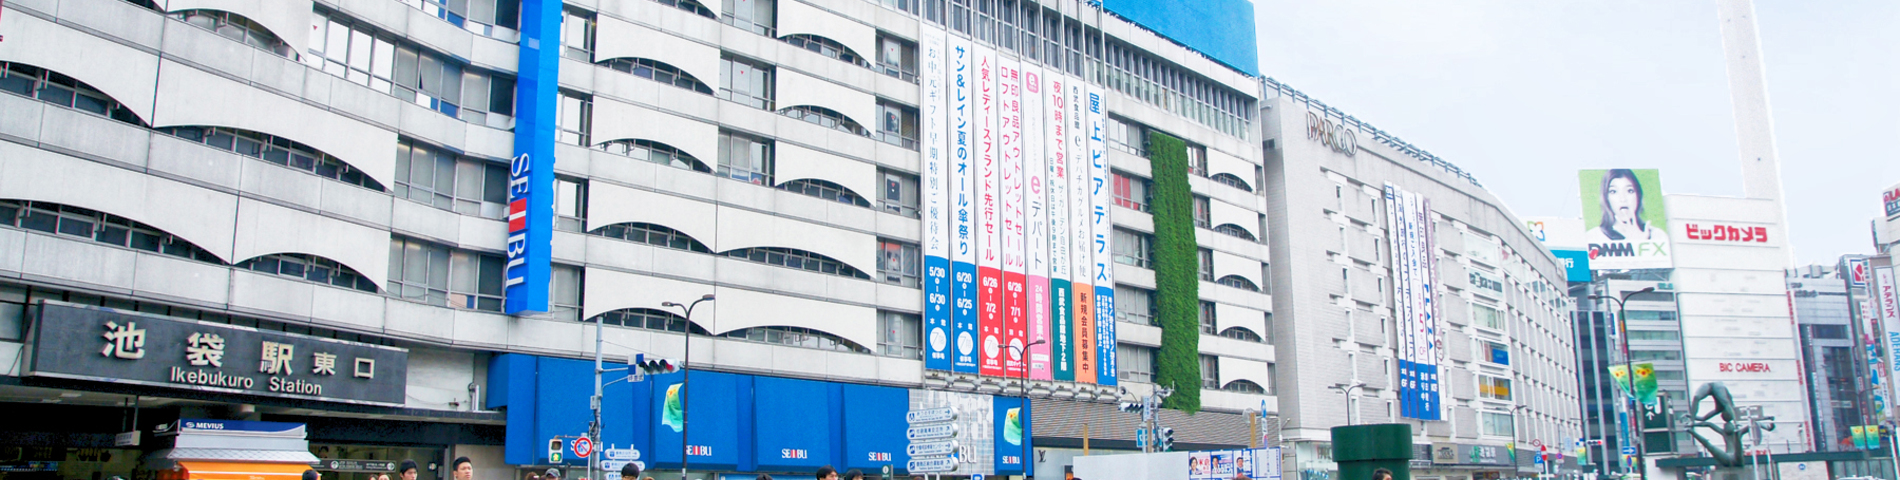 ISI Language School - Ikebukuro Campus photo 1